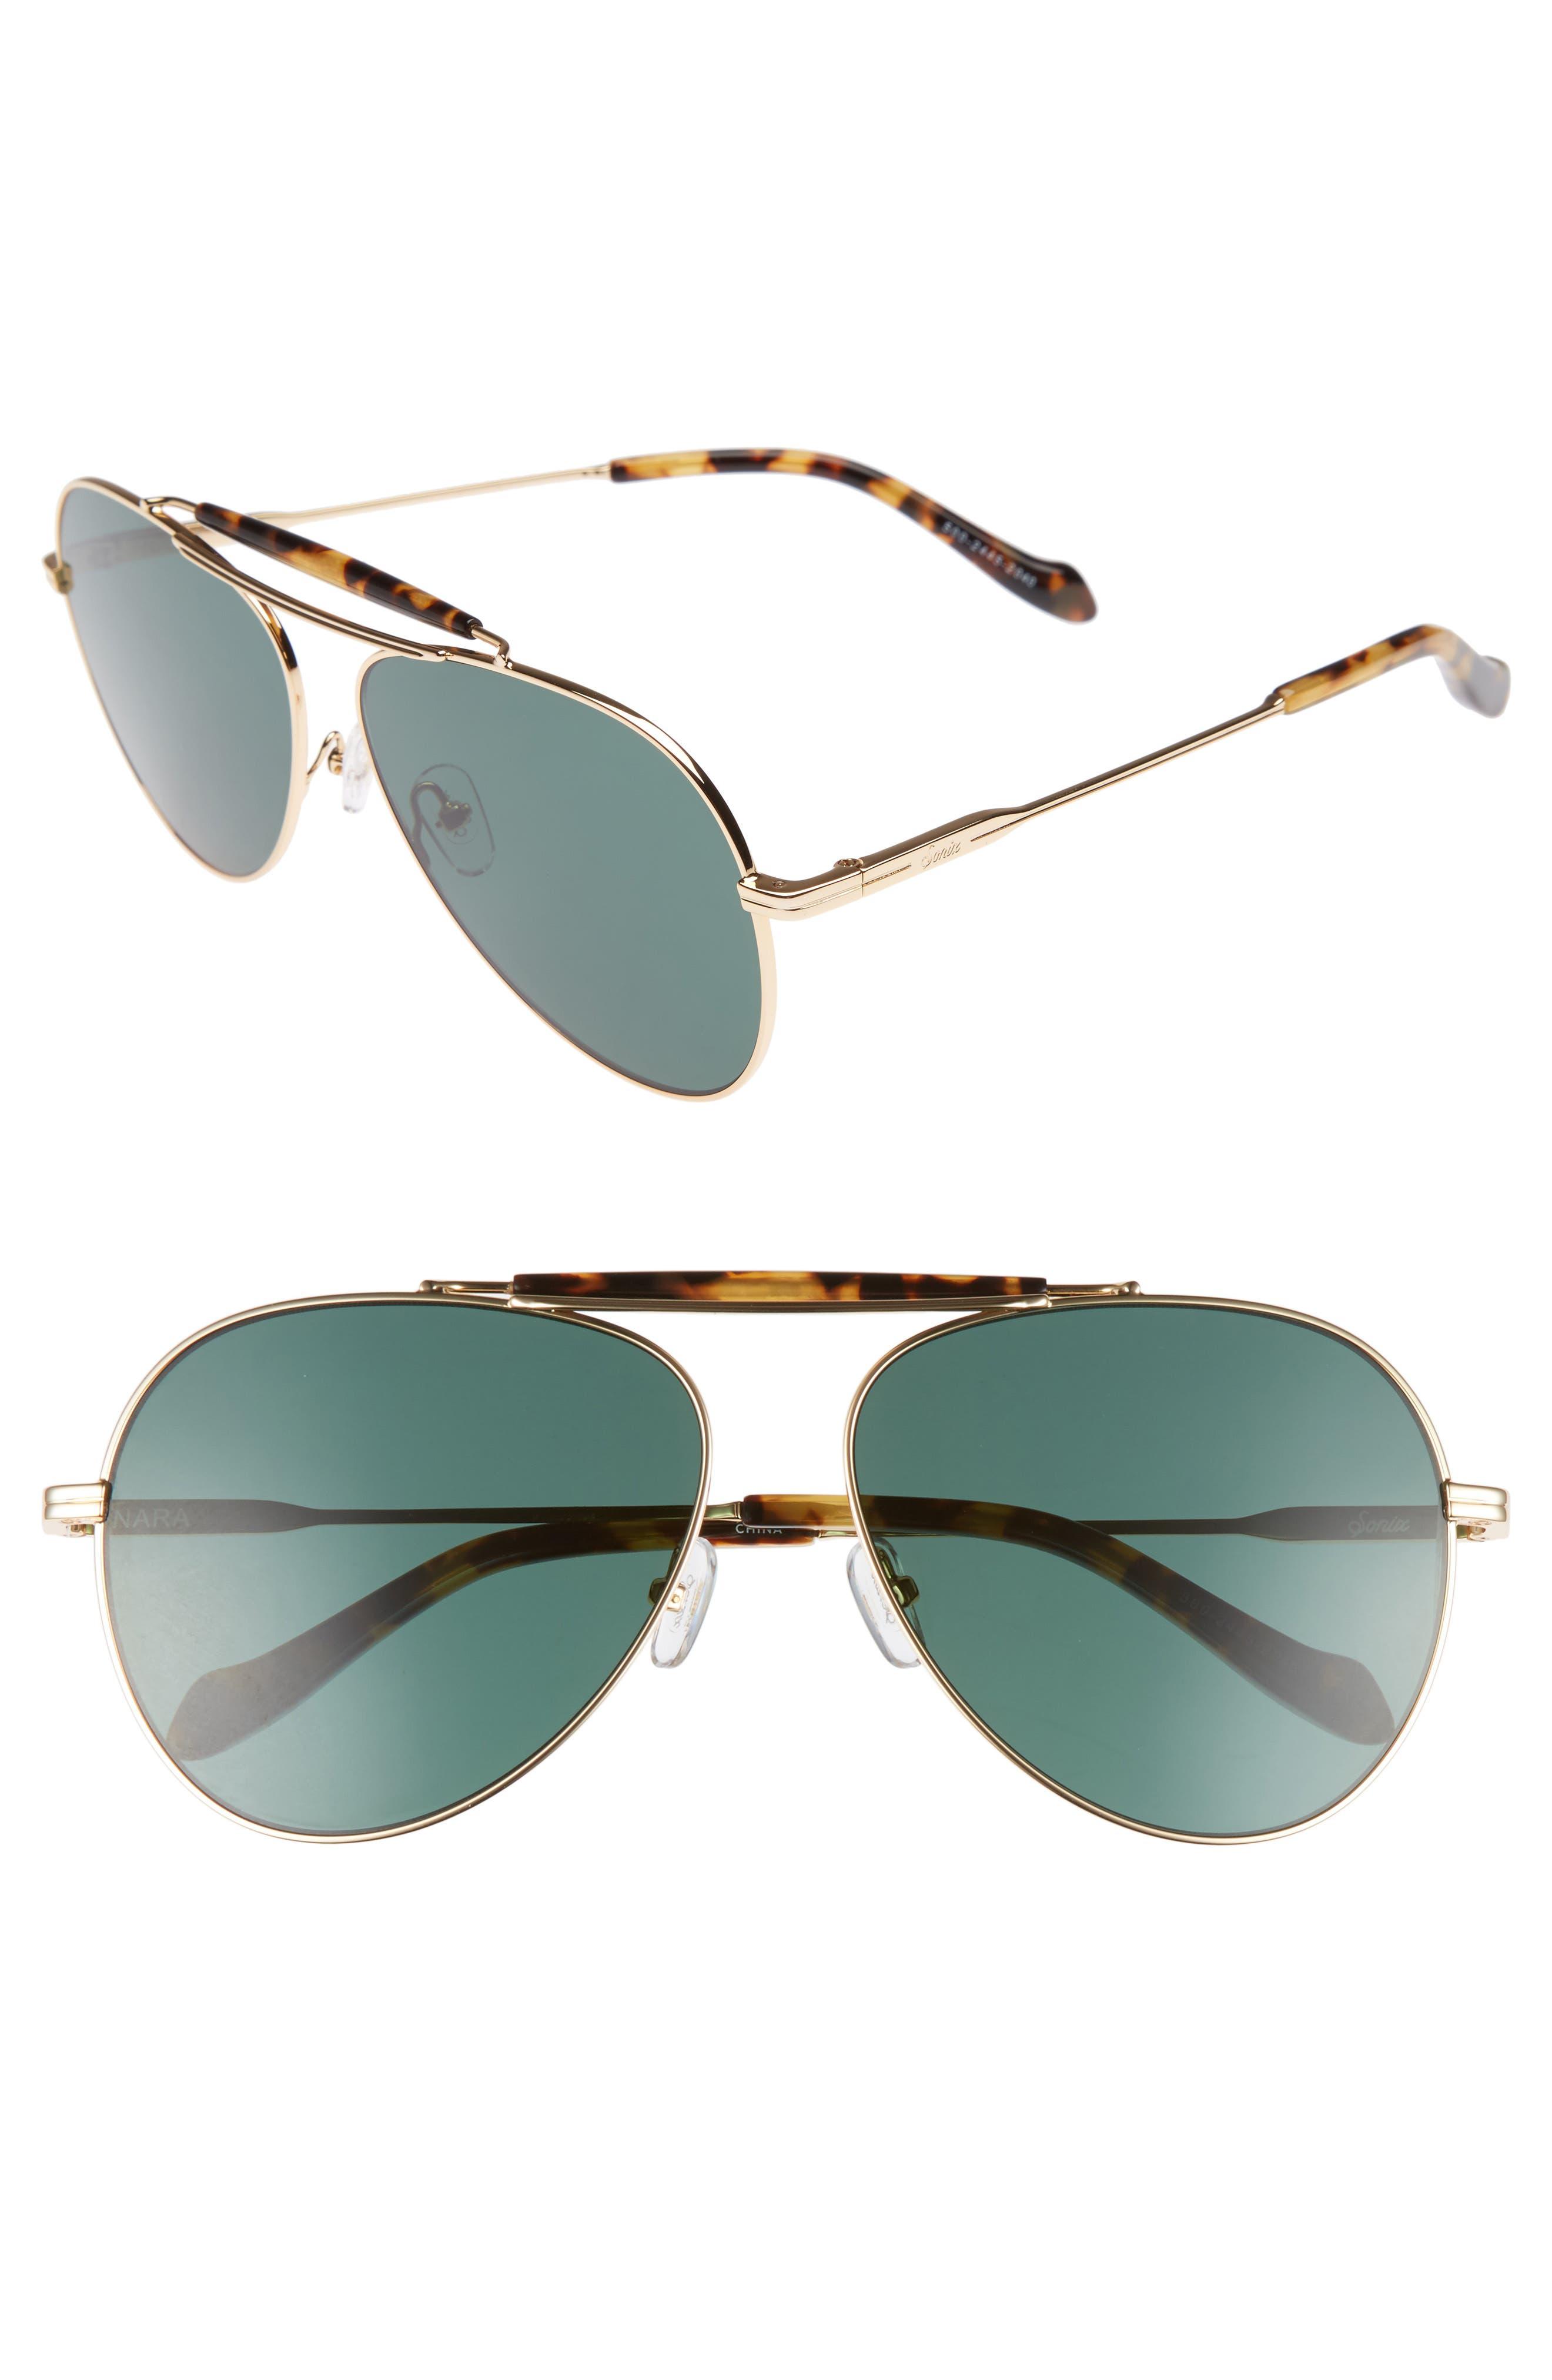 Nara 60mm Aviator Sunglasses,                             Main thumbnail 1, color,